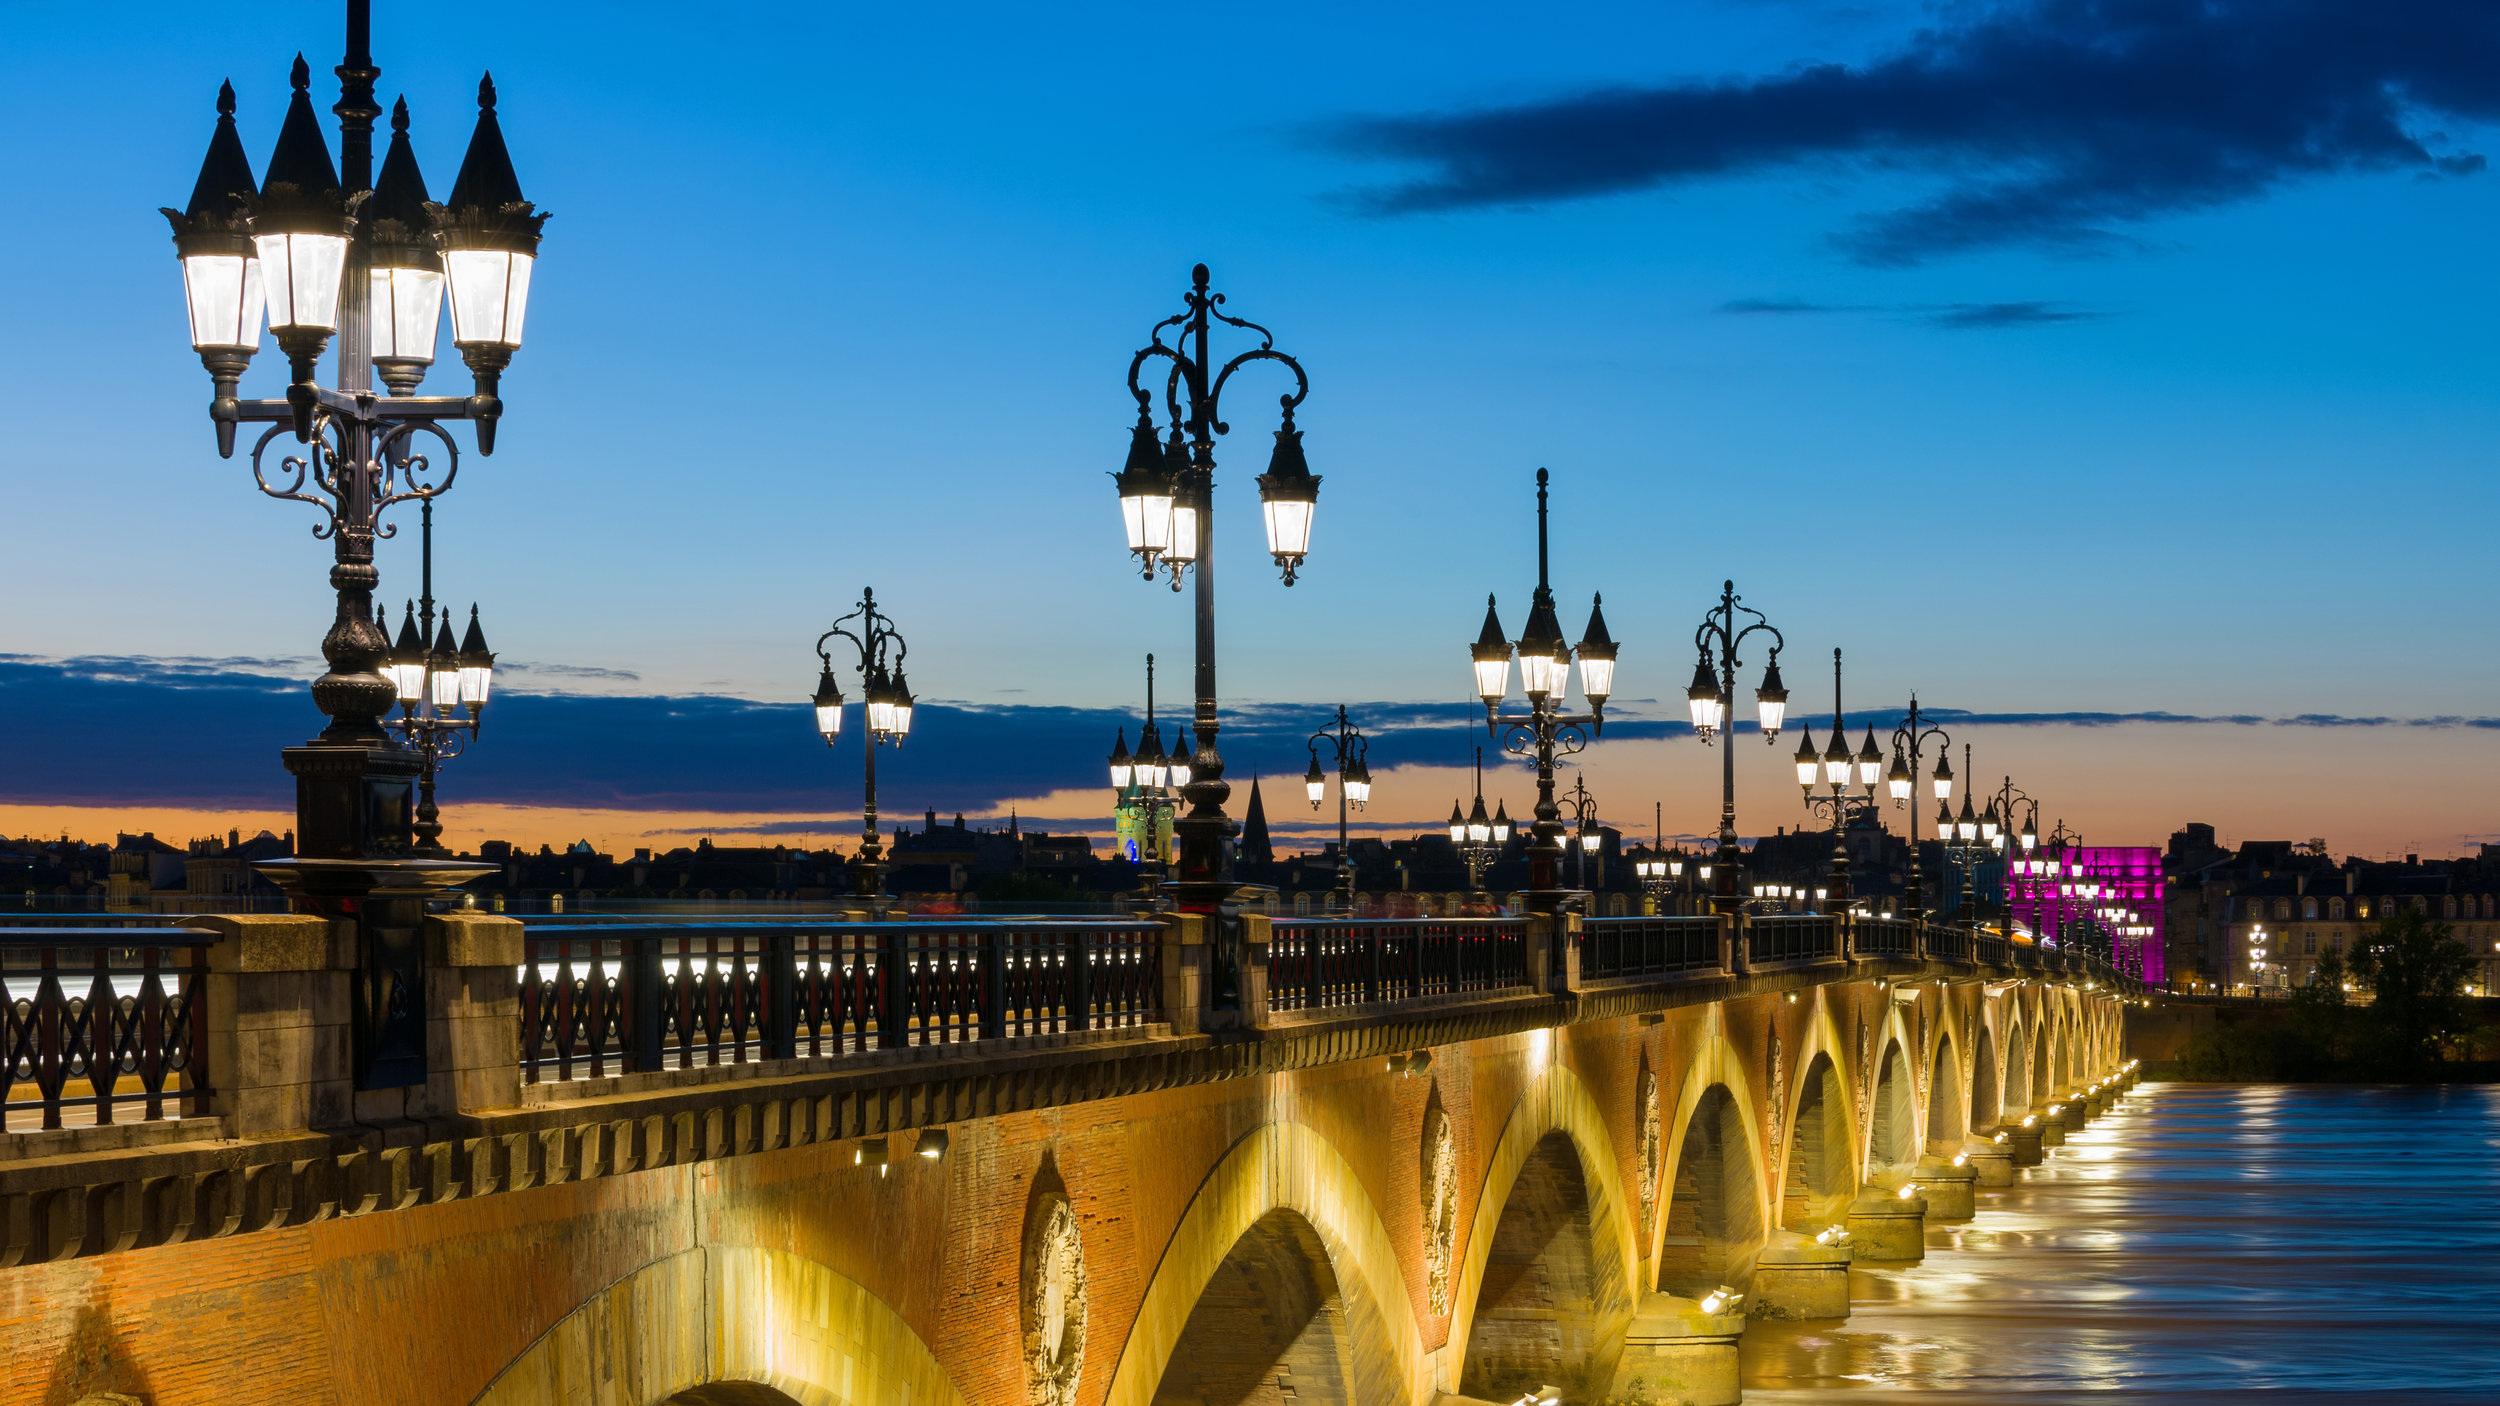 bigstock-Summer-Night-In-Bordeaux-56309423_flip.jpg